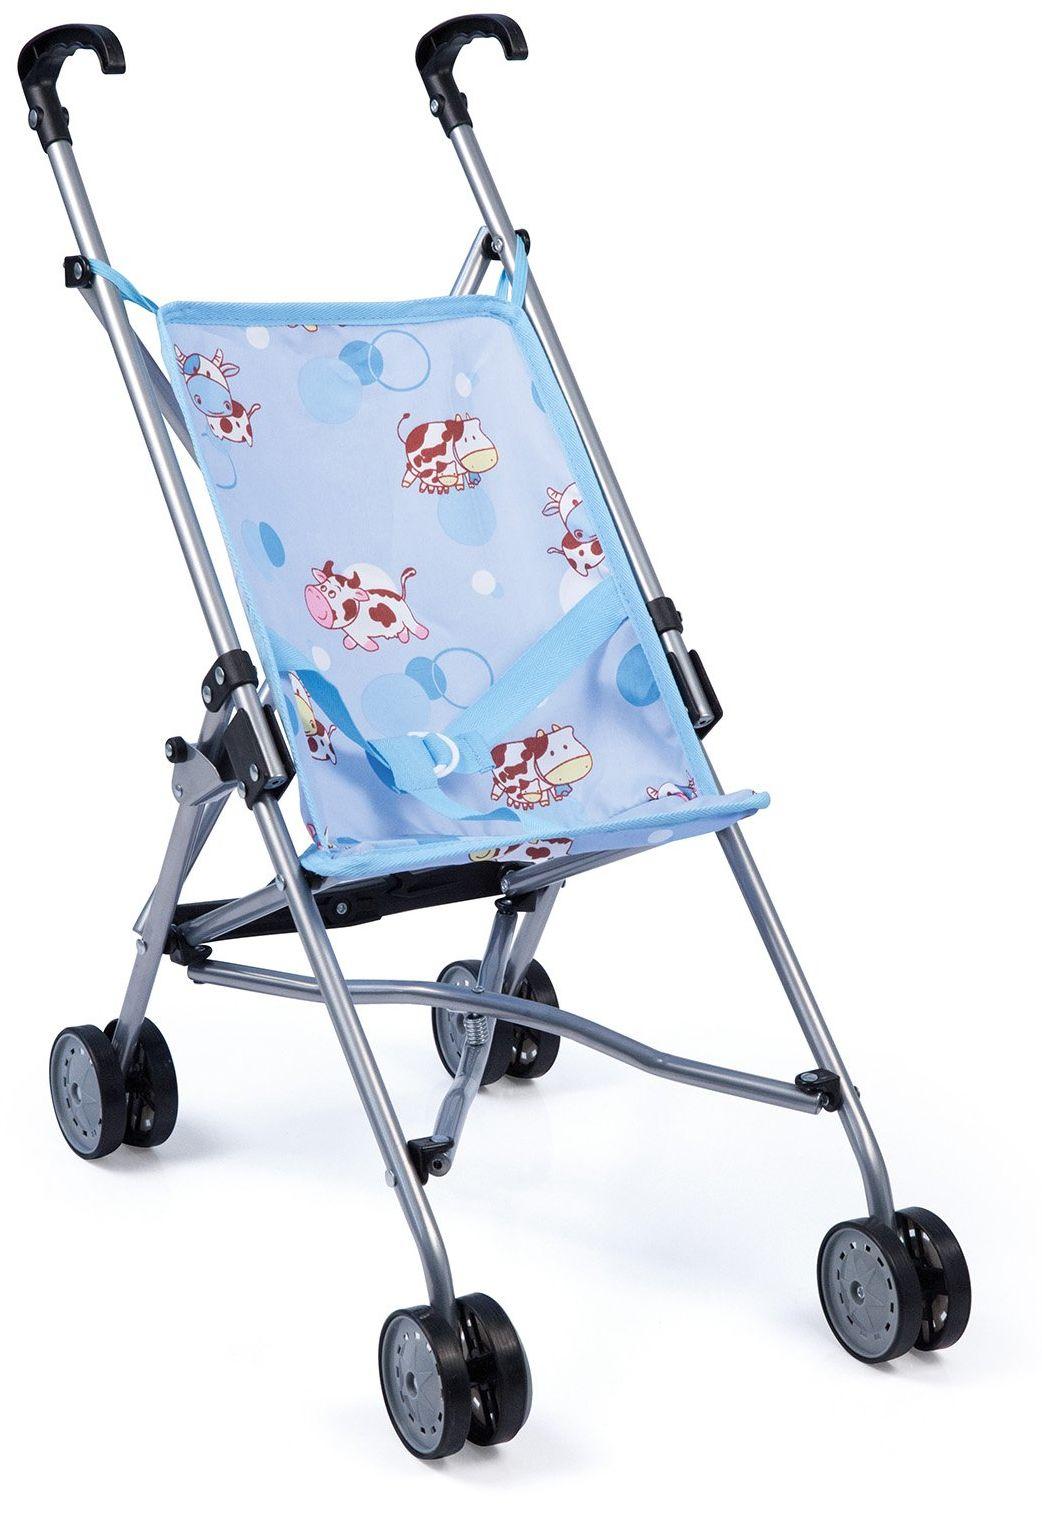 Bayer Design 3013401 - lalki Buggy, niebieskie